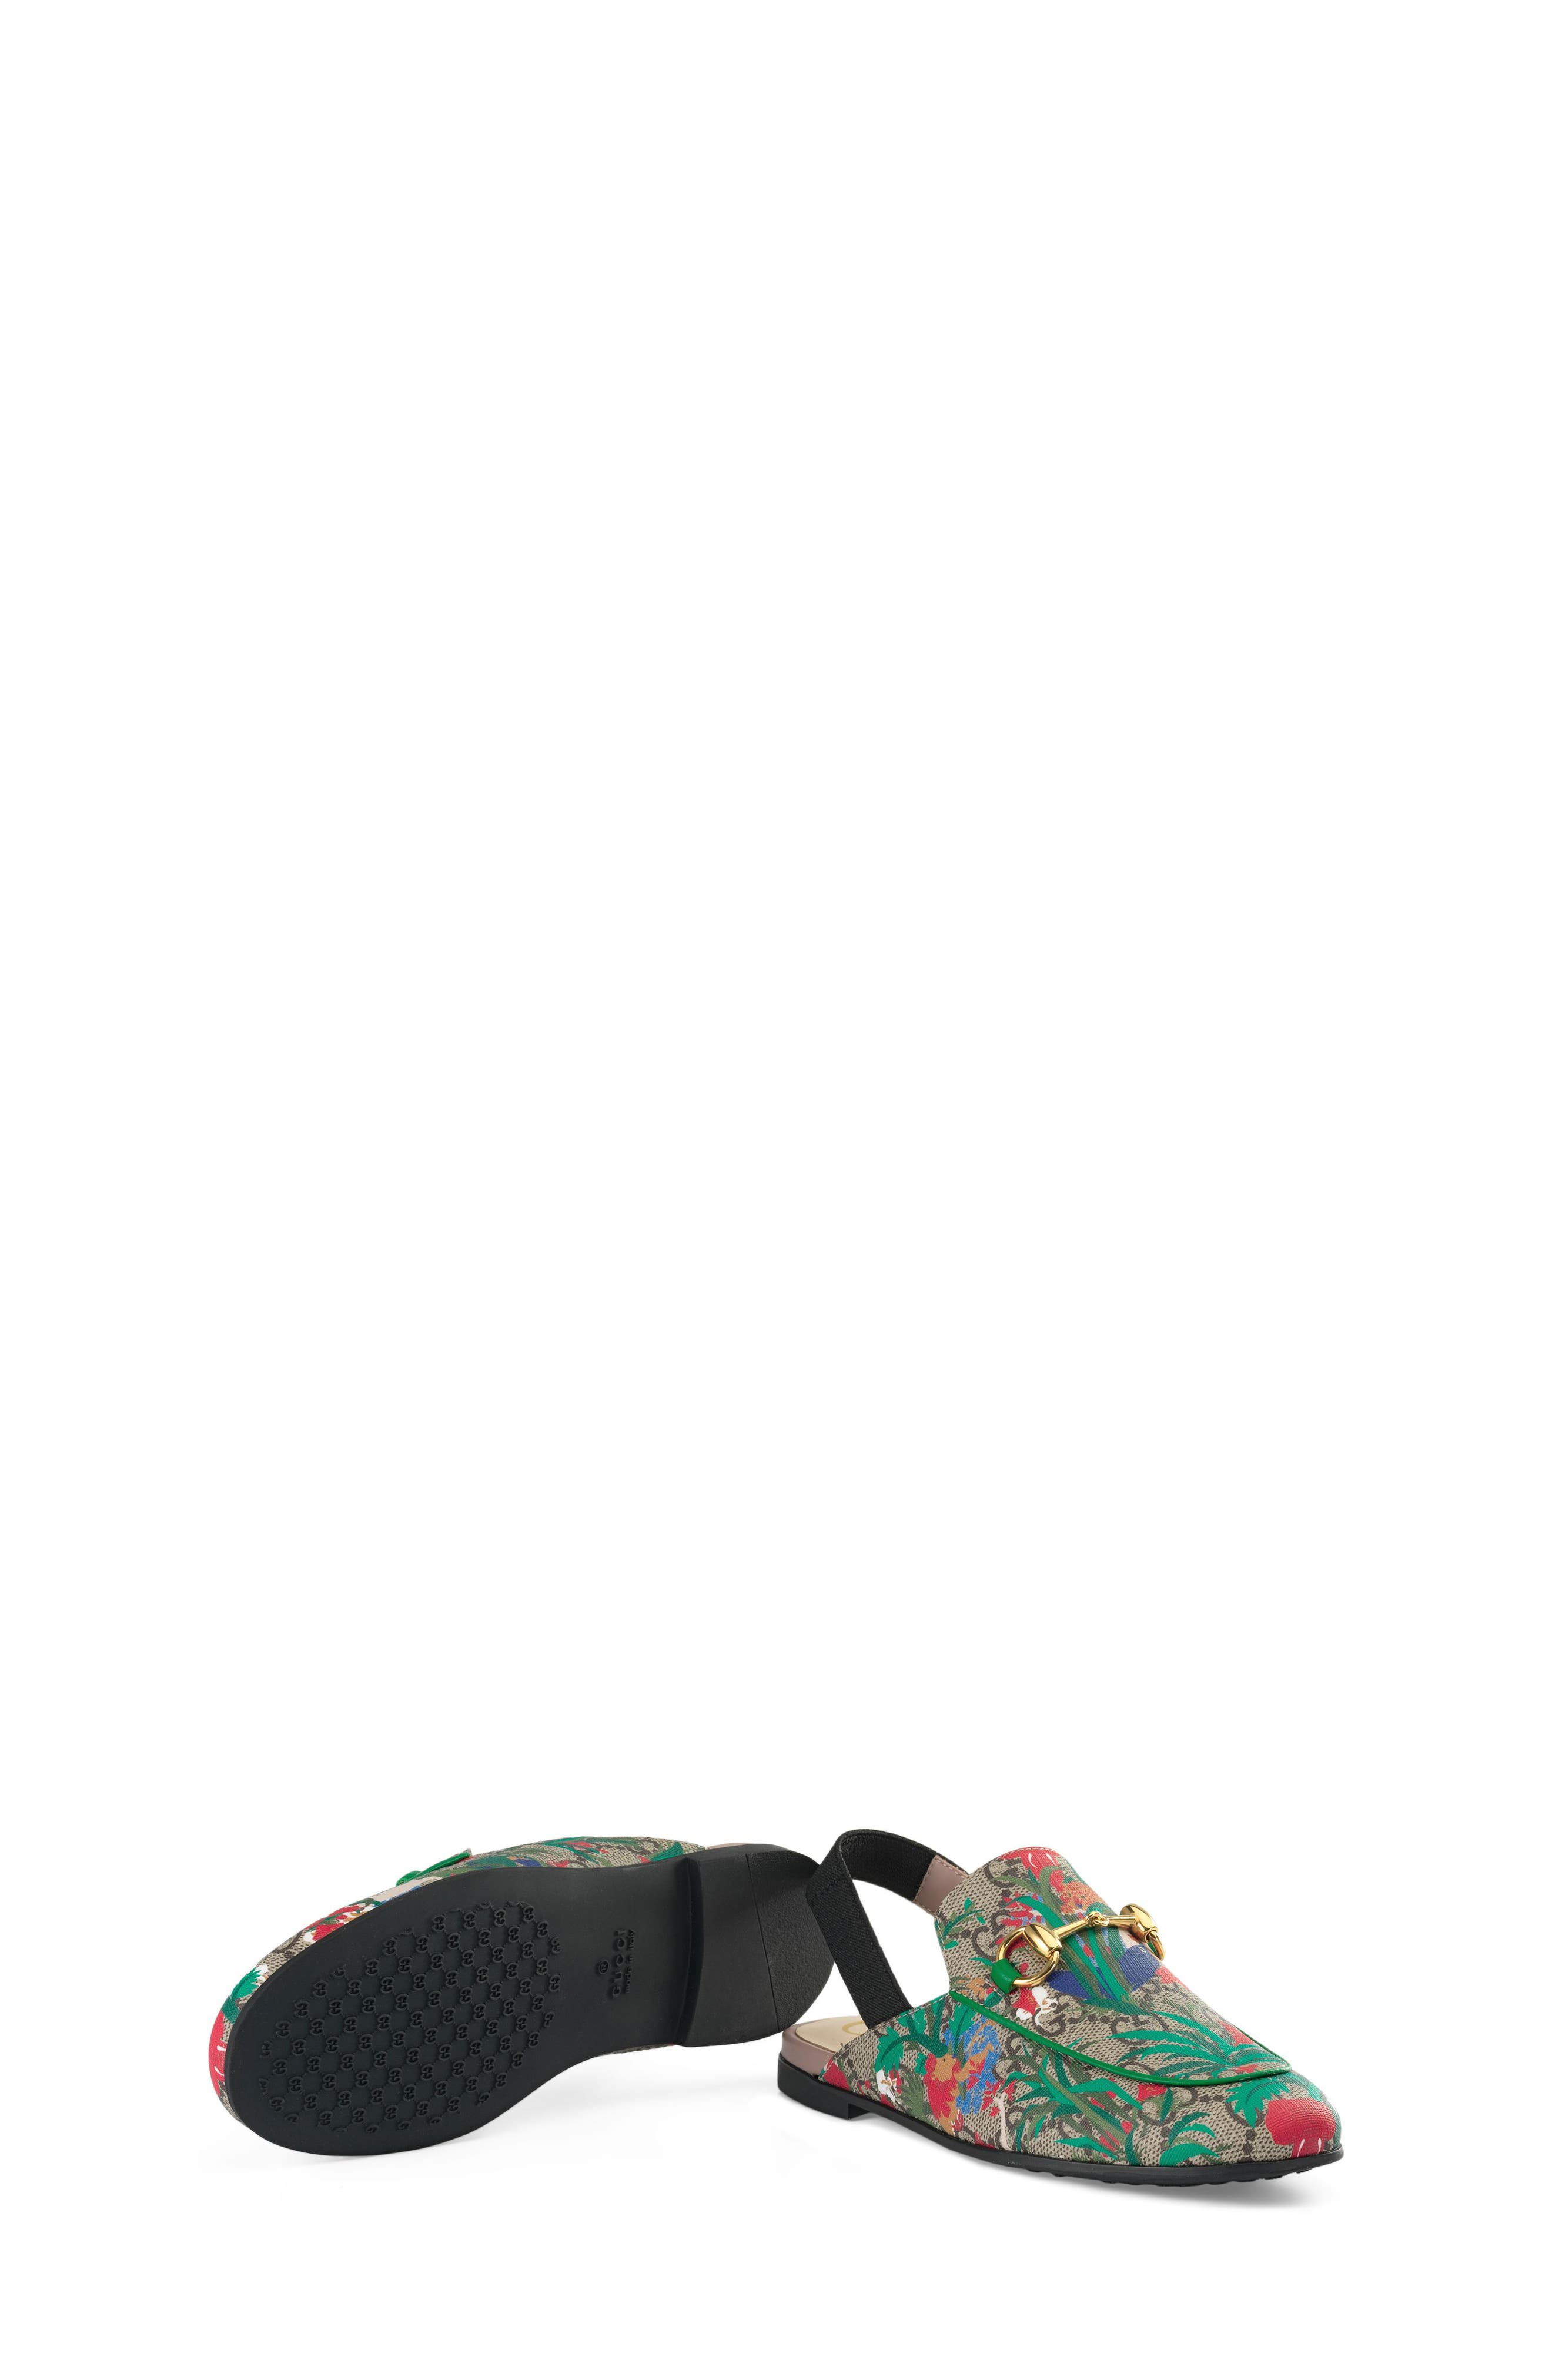 Princetown Slingback Loafer Mule,                             Alternate thumbnail 5, color,                             BEIGE EBONY MULTI